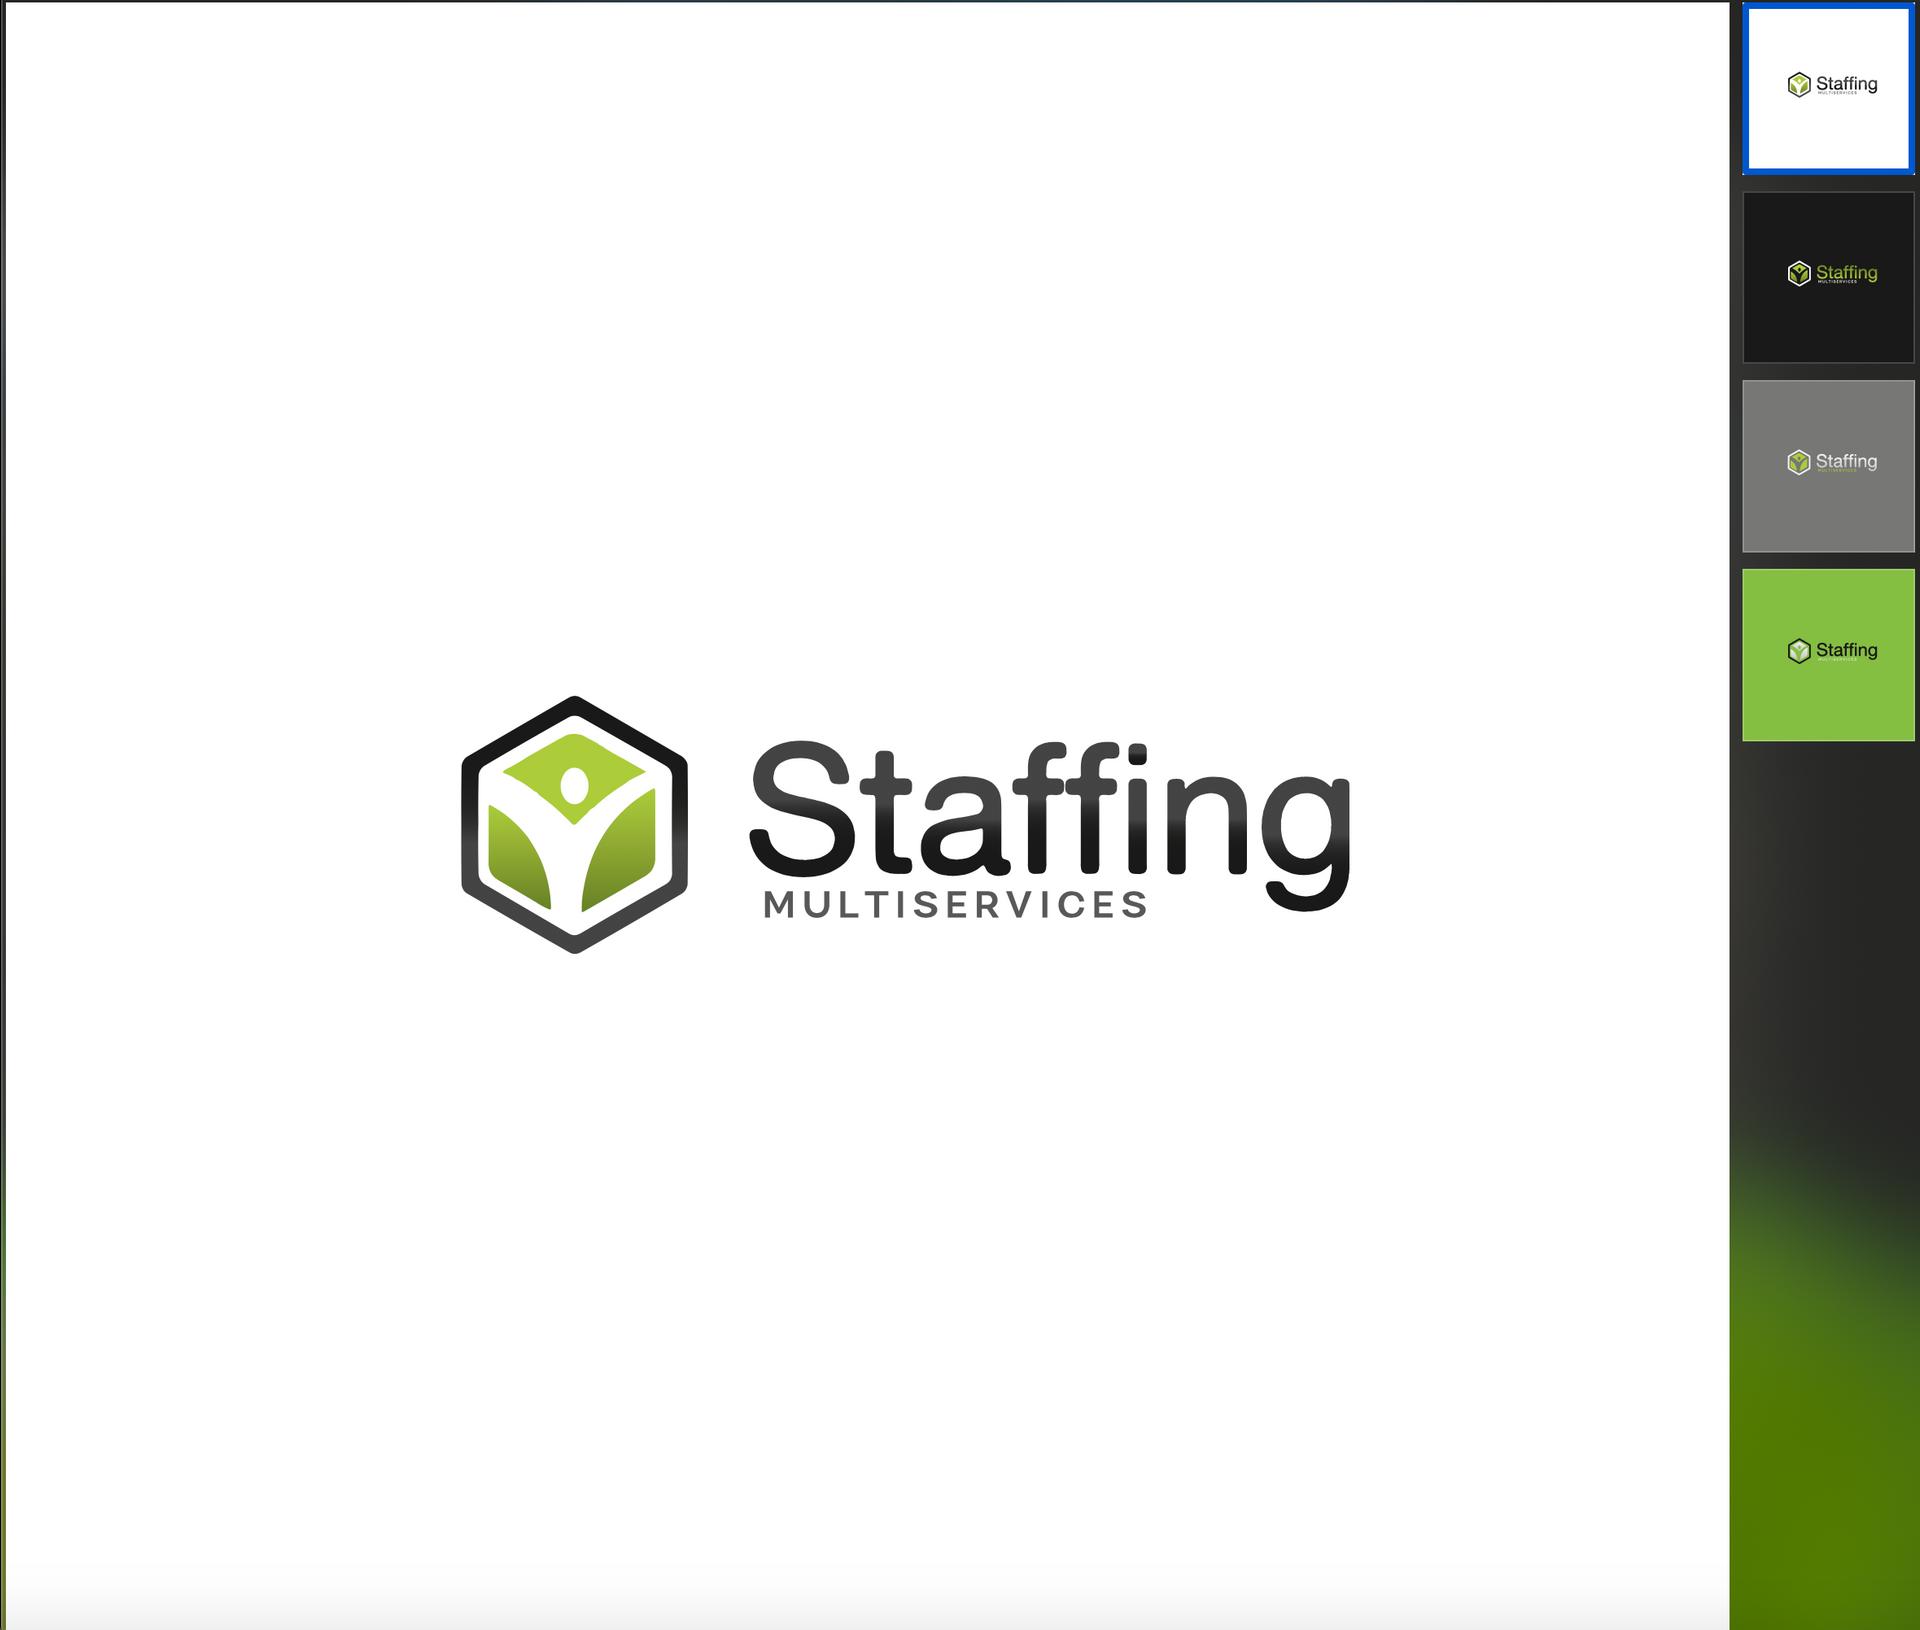 Staffing Multiservices Logo